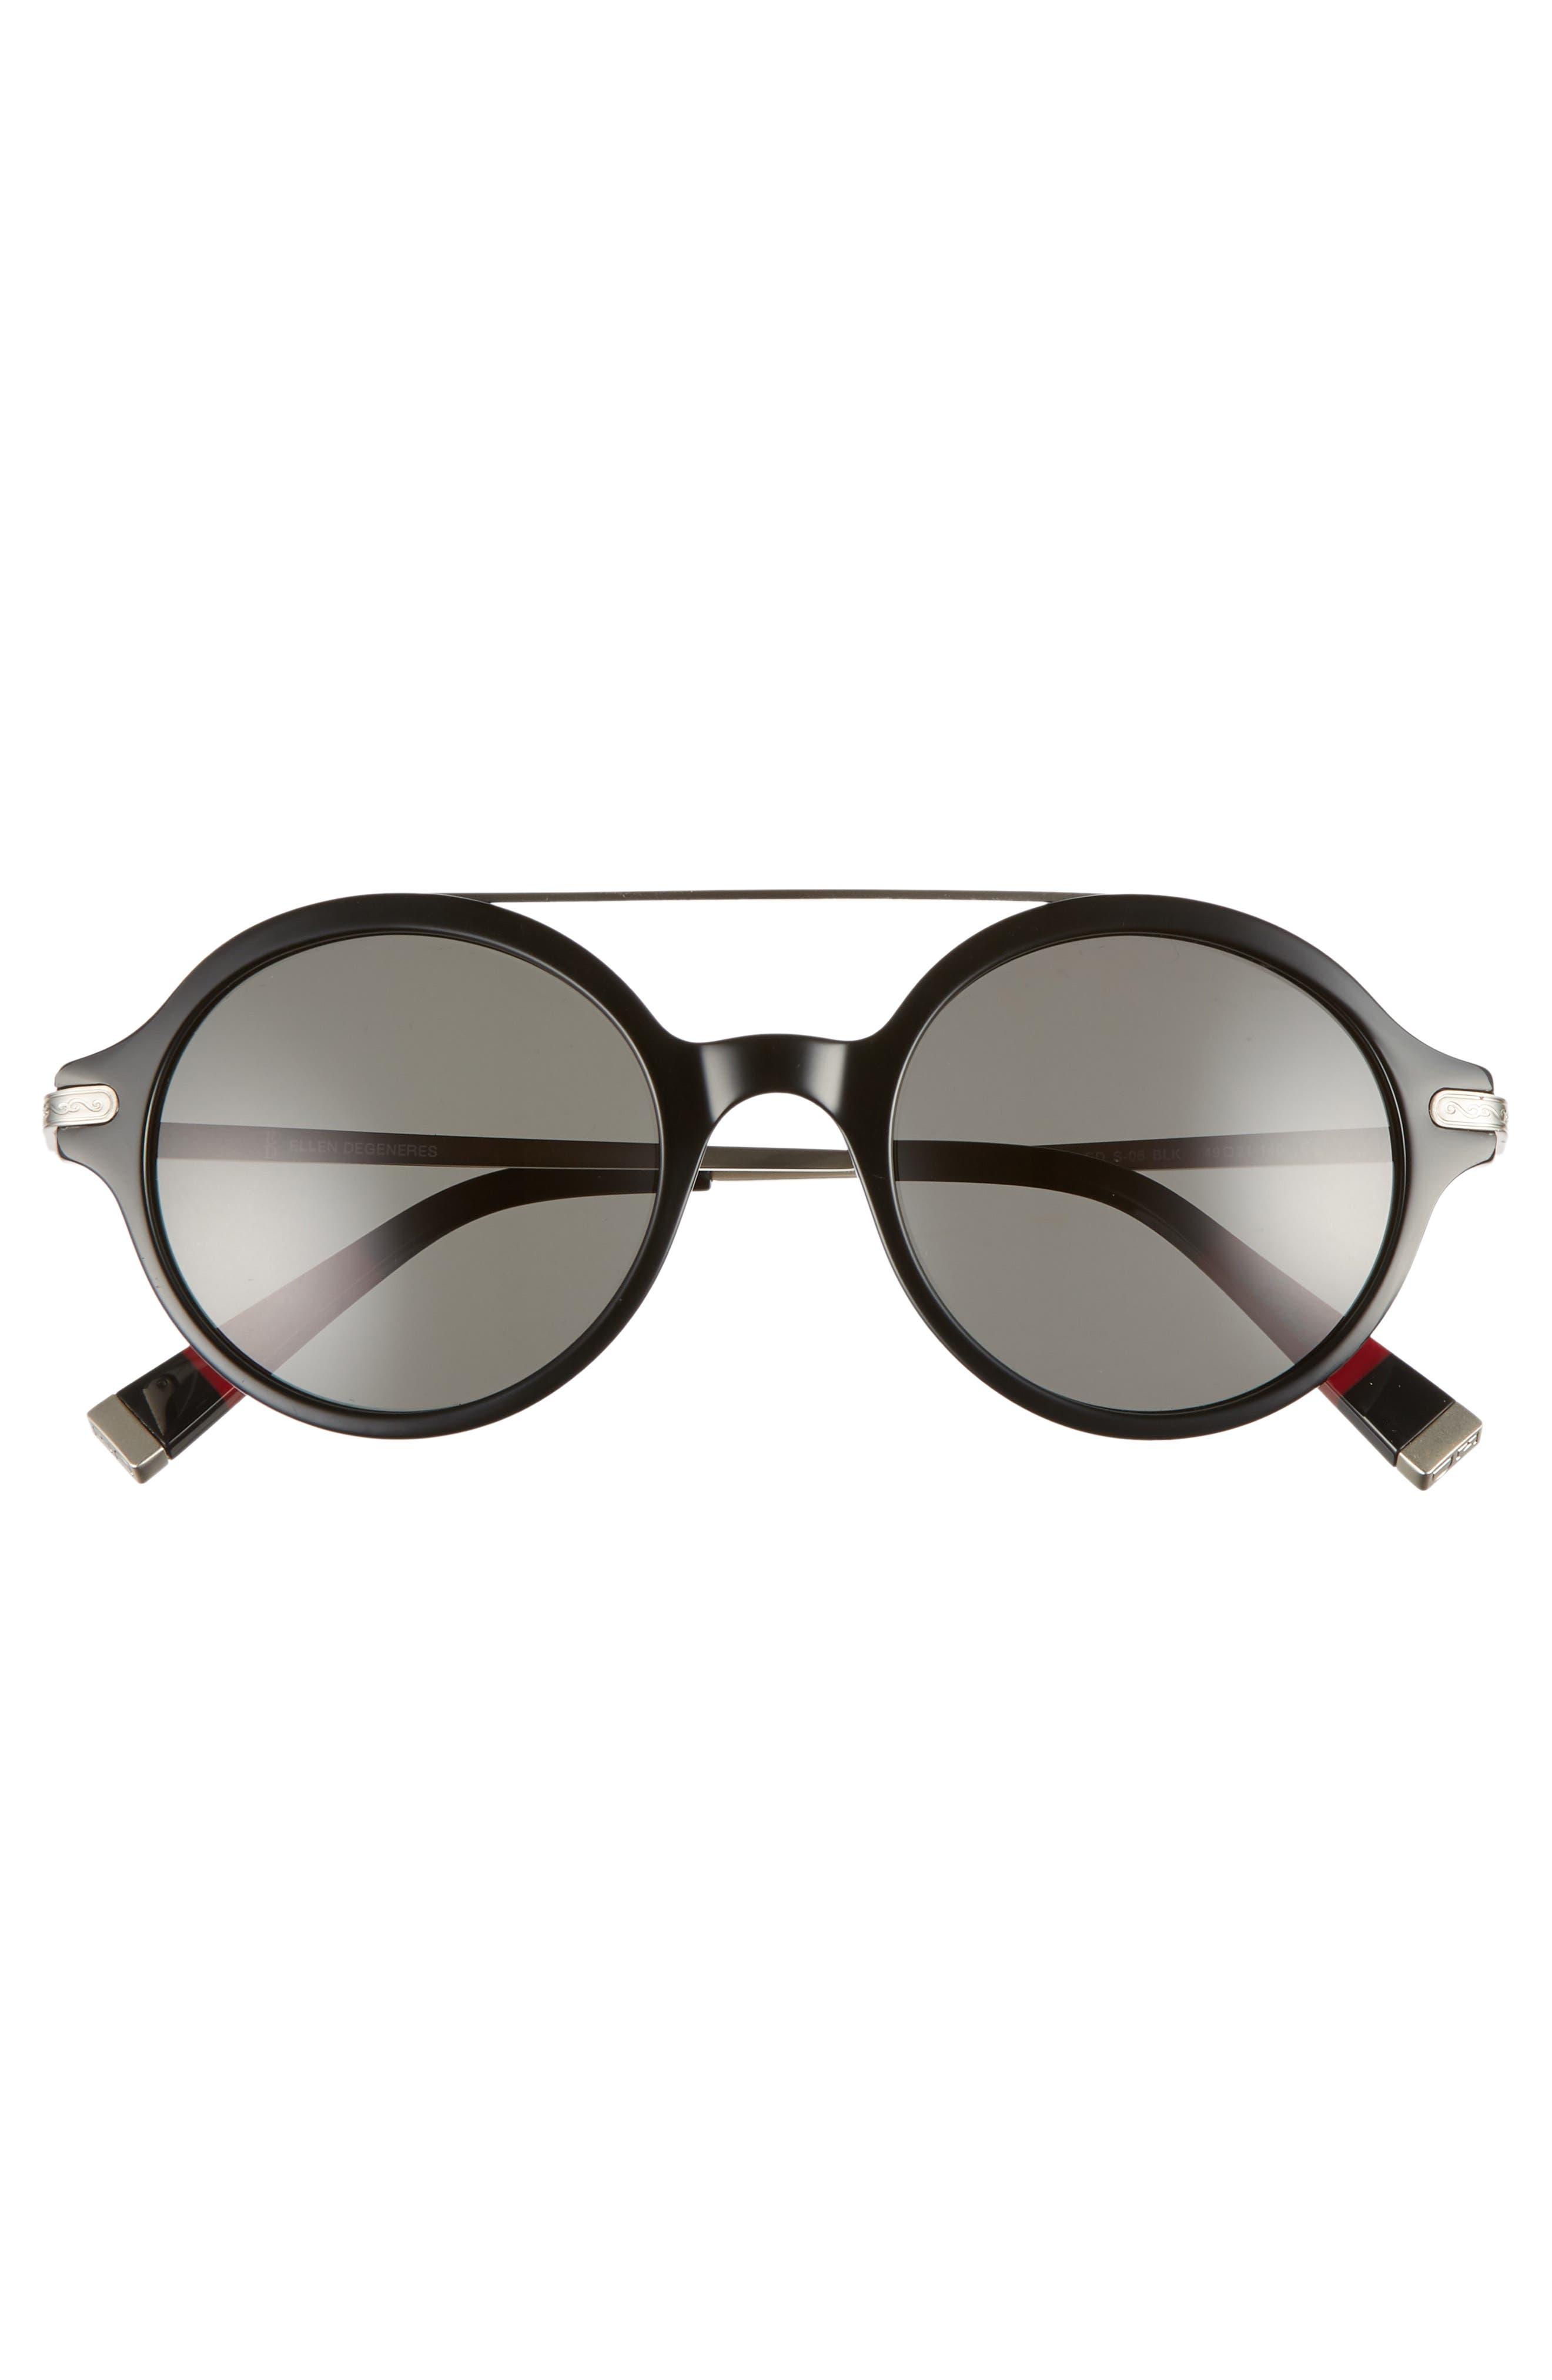 49mm Round Sunglasses,                             Alternate thumbnail 3, color,                             BLACK